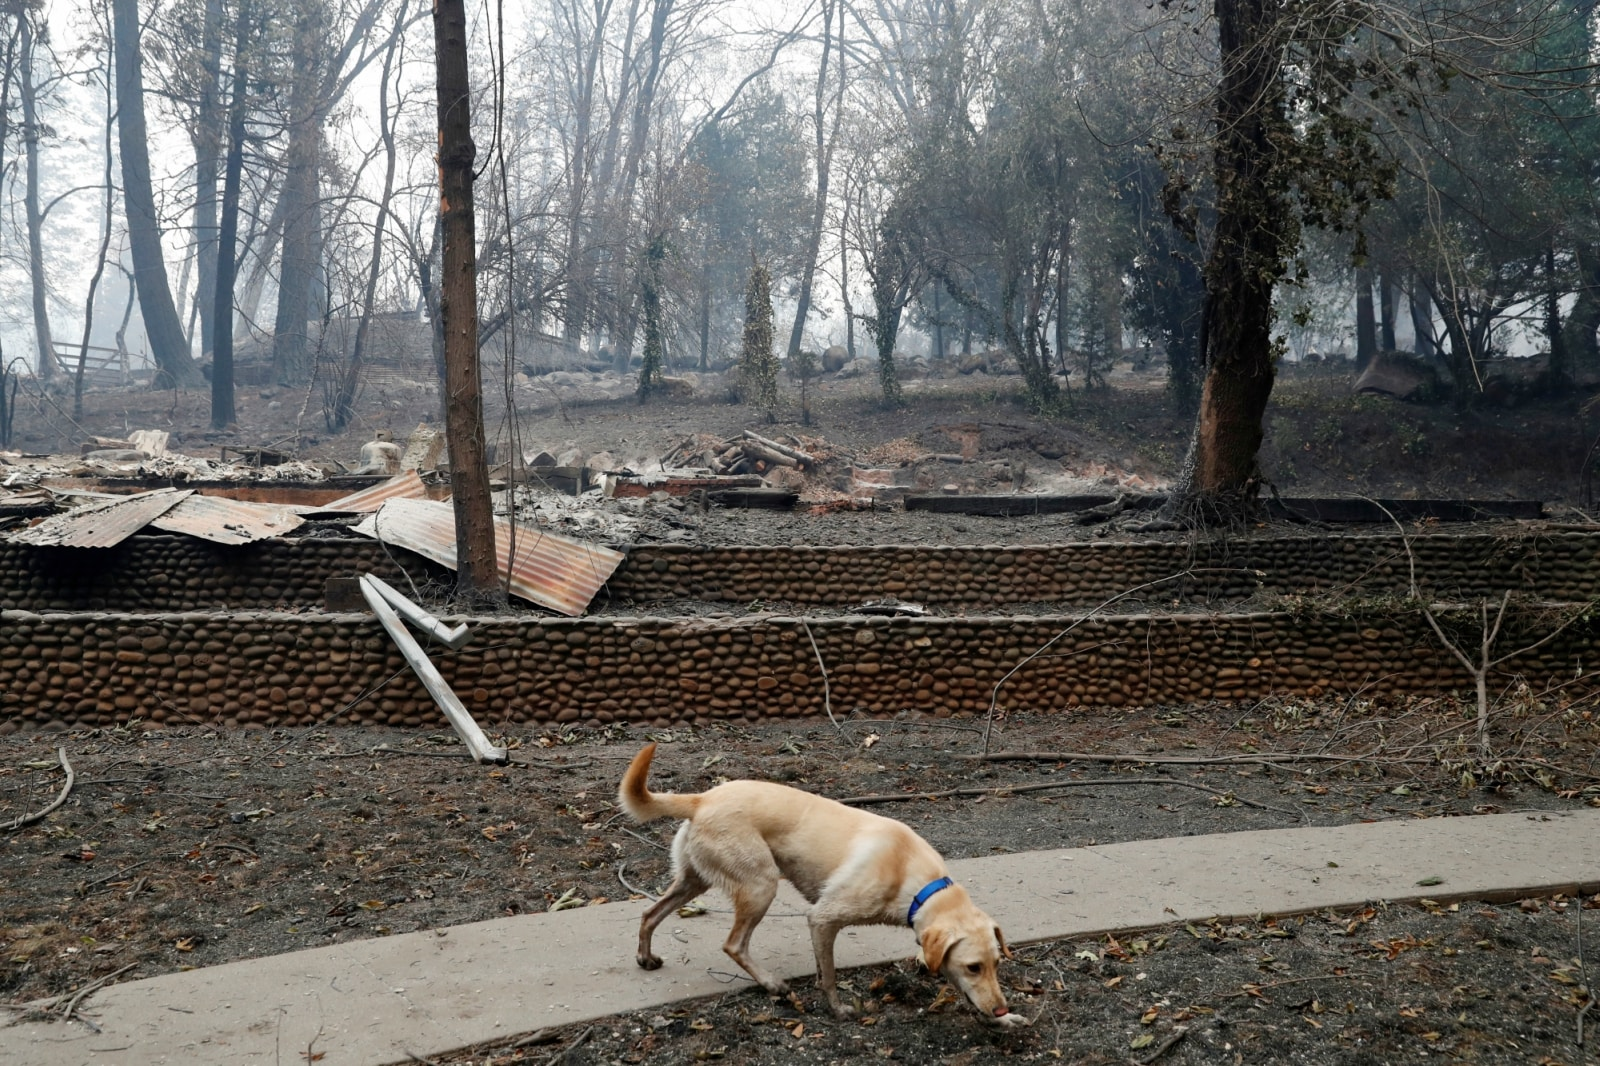 Cadaver Dogs Lead Grim Search For Victims In California Fire